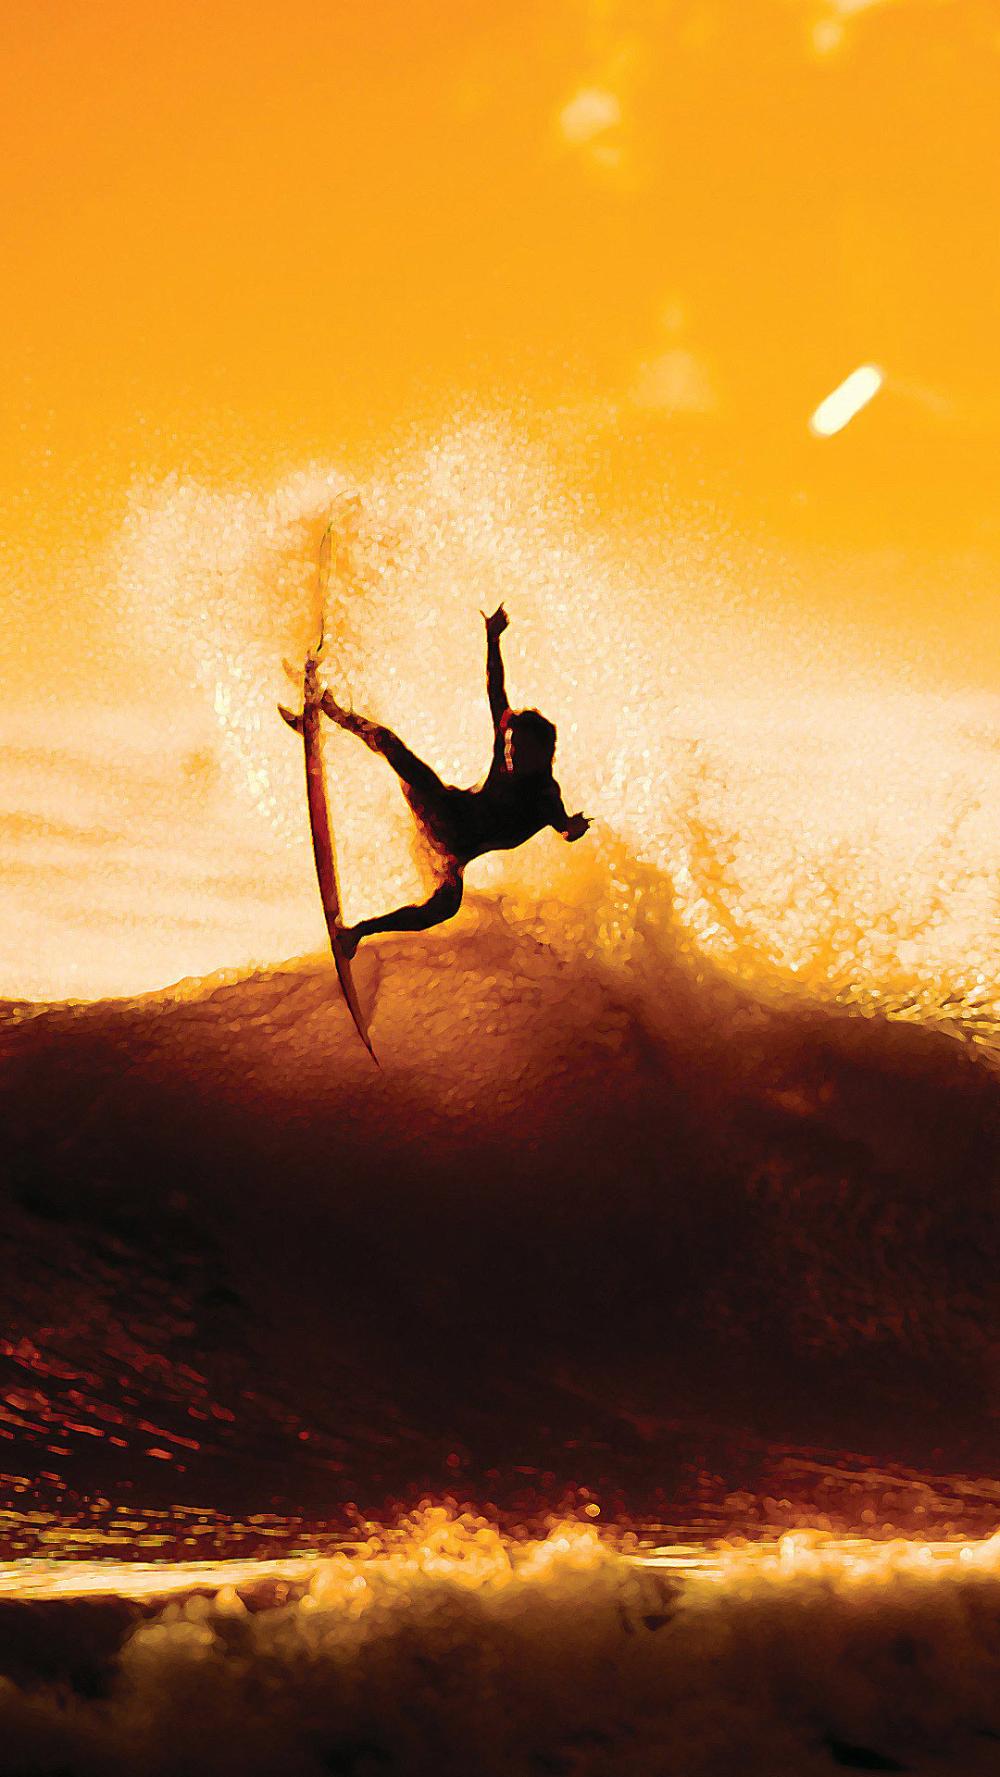 Surfing Sunset Sea Yellow Orange Wallpaper Background Wallpaper Background Iphone Phone Mobile In 2020 Surfing Photography Surfing Sunset Sea